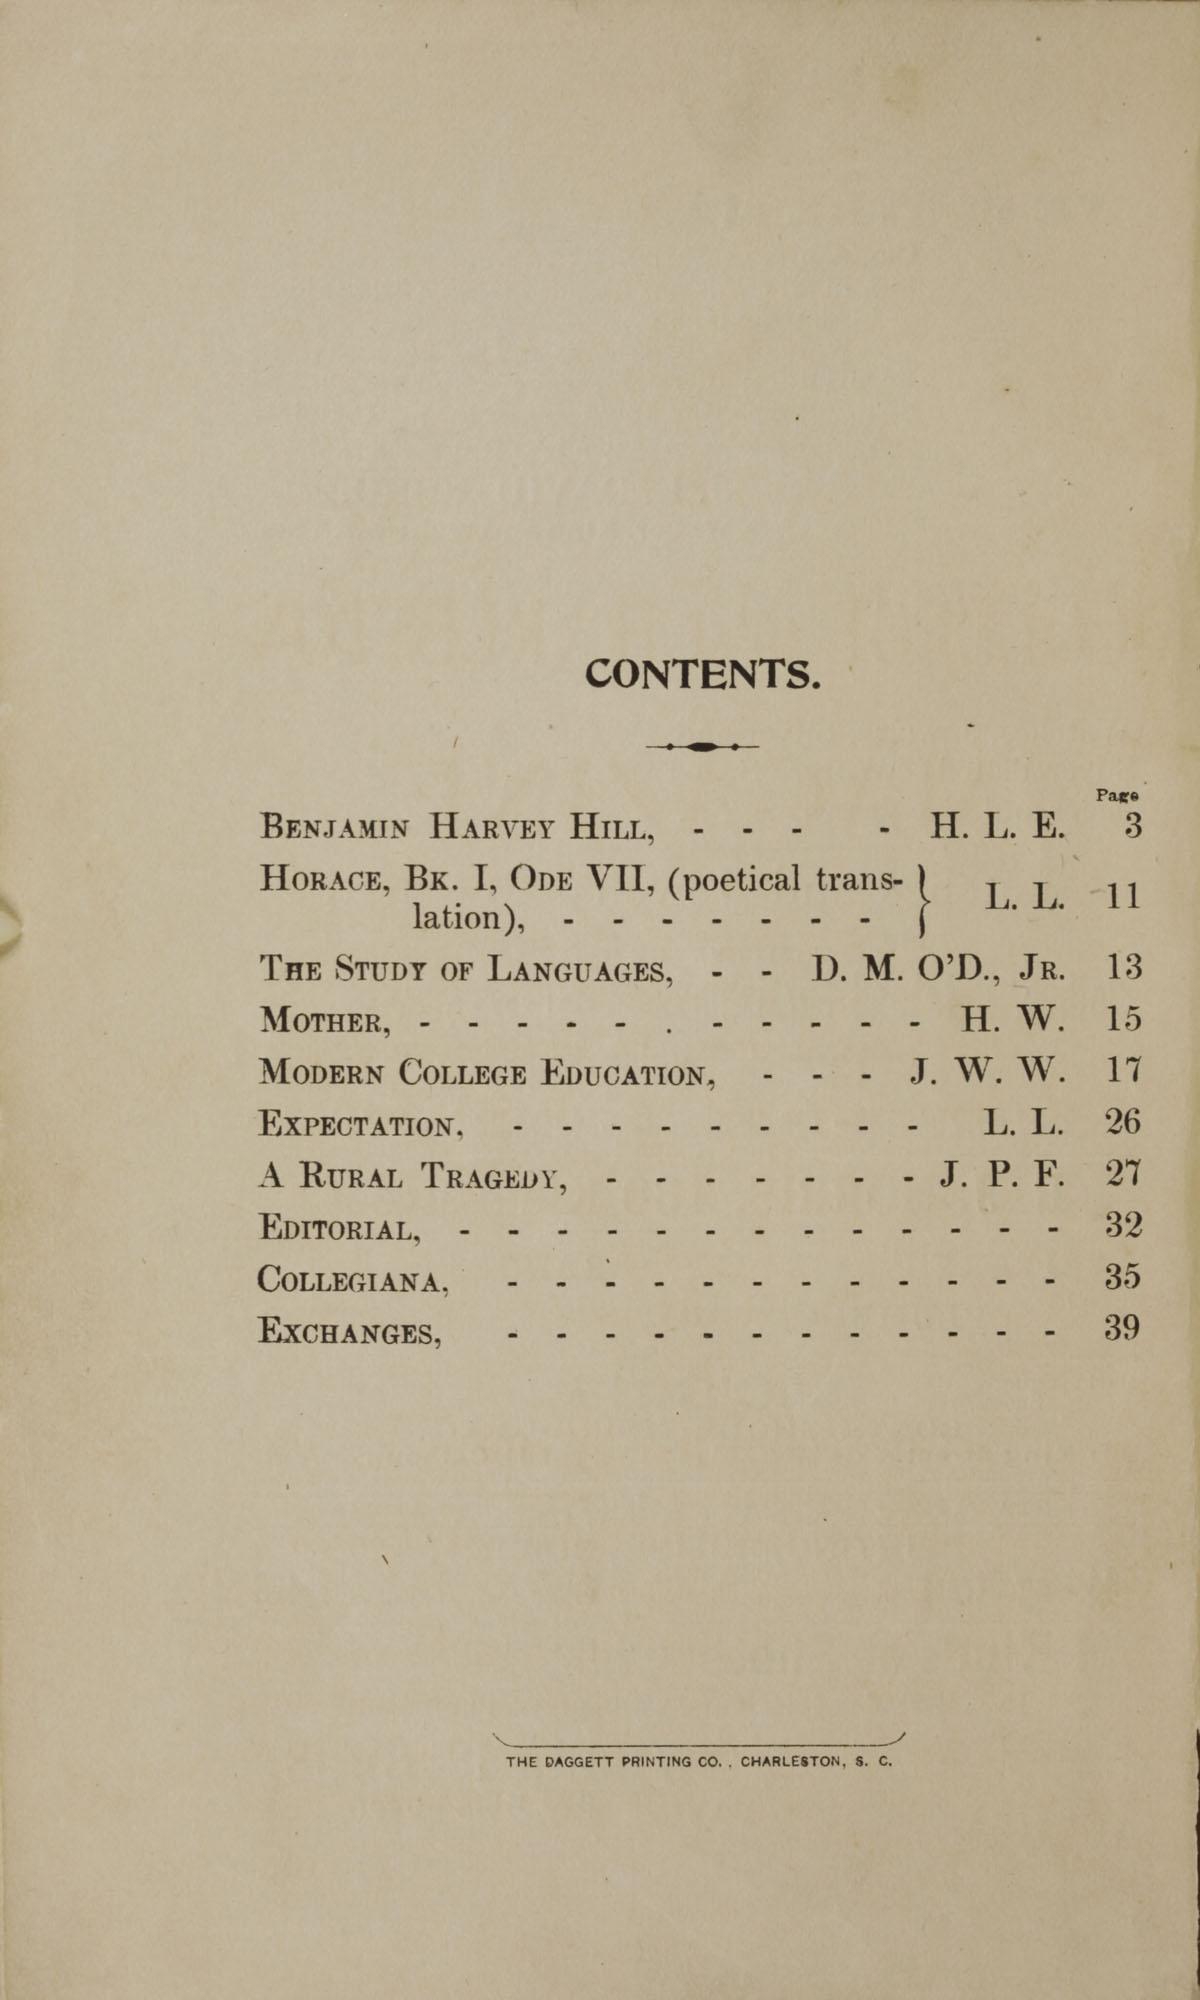 College of Charleston Magazine, 1898, Vol I. No. 1, page 2